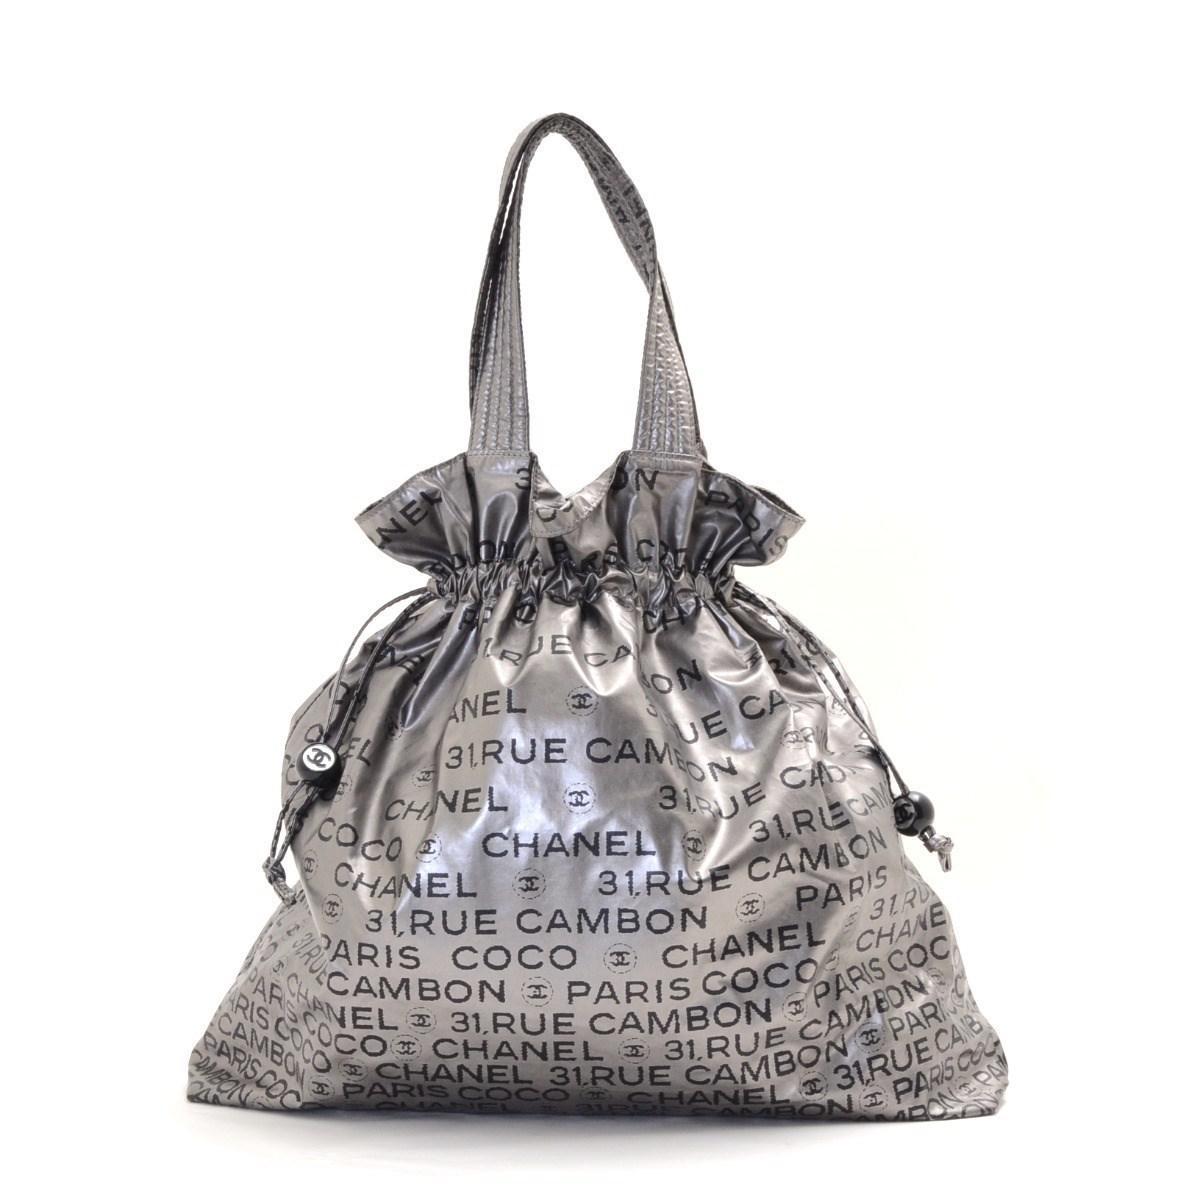 Lyst - Chanel Nylon Unlimited Line Logo Print Tote Bag in Metallic 4c2e6d87d7fe5